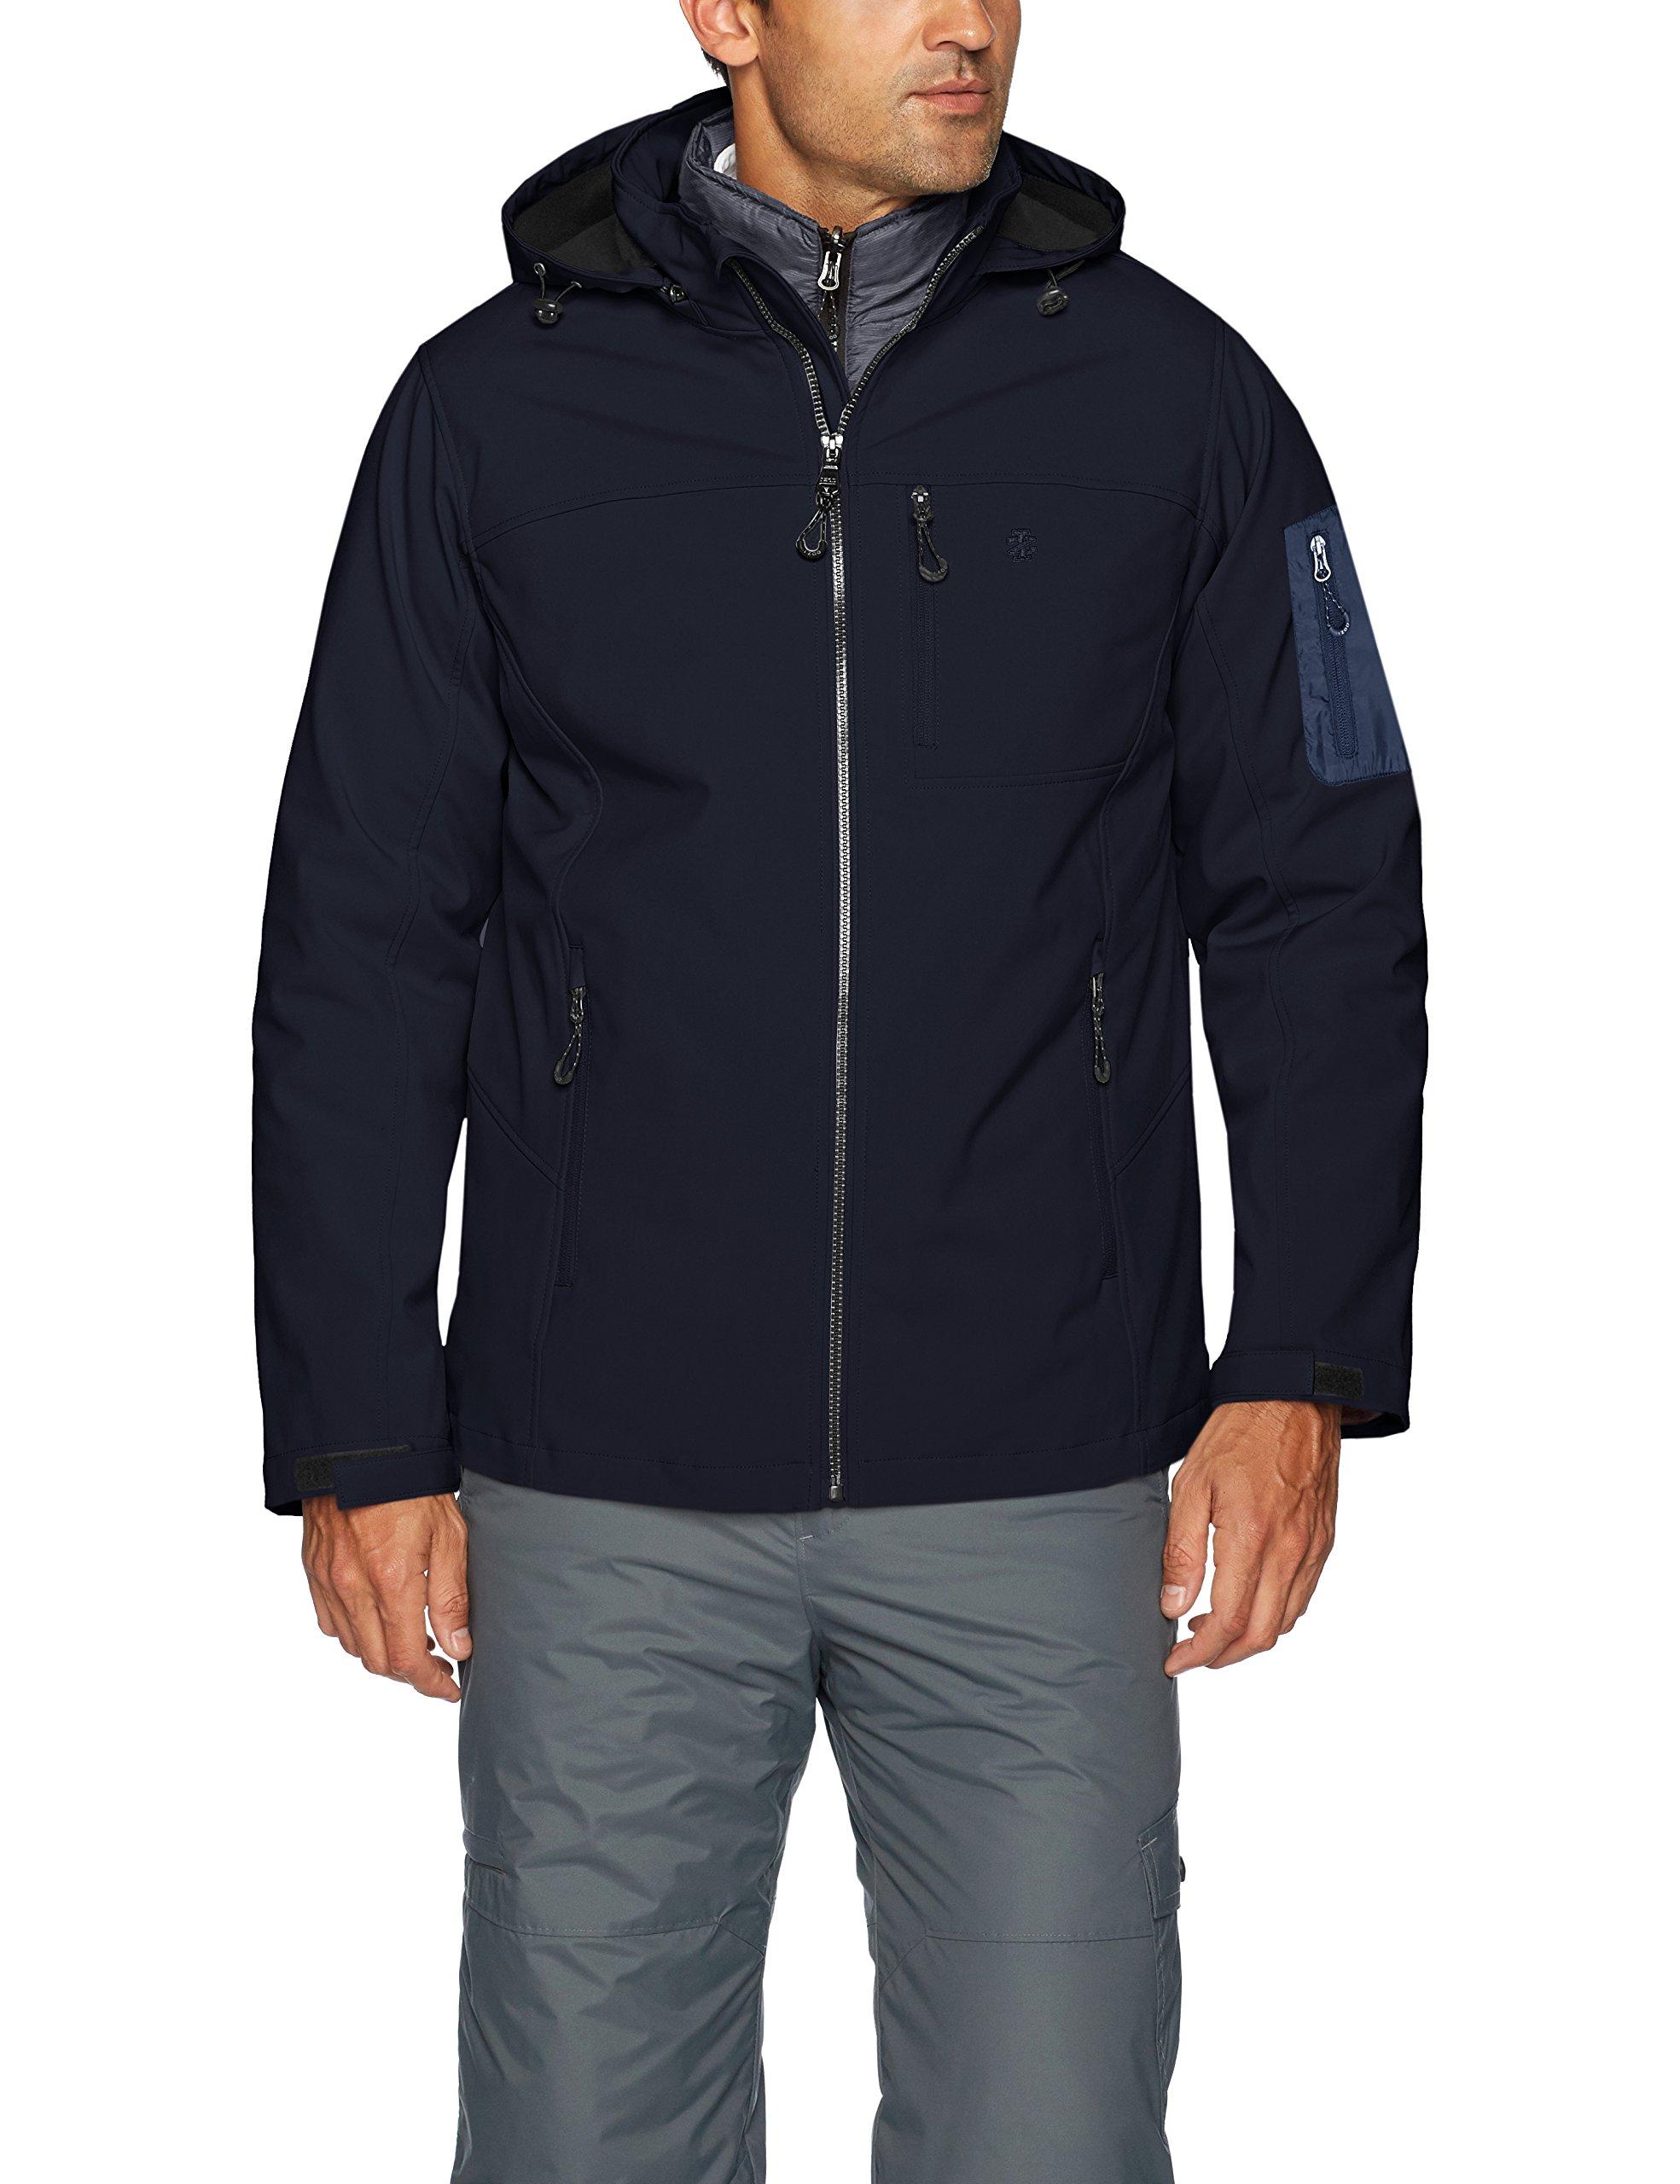 IZOD Men's 3-in-1 Soft-Shell Systems Jacket, Midnight, XXL